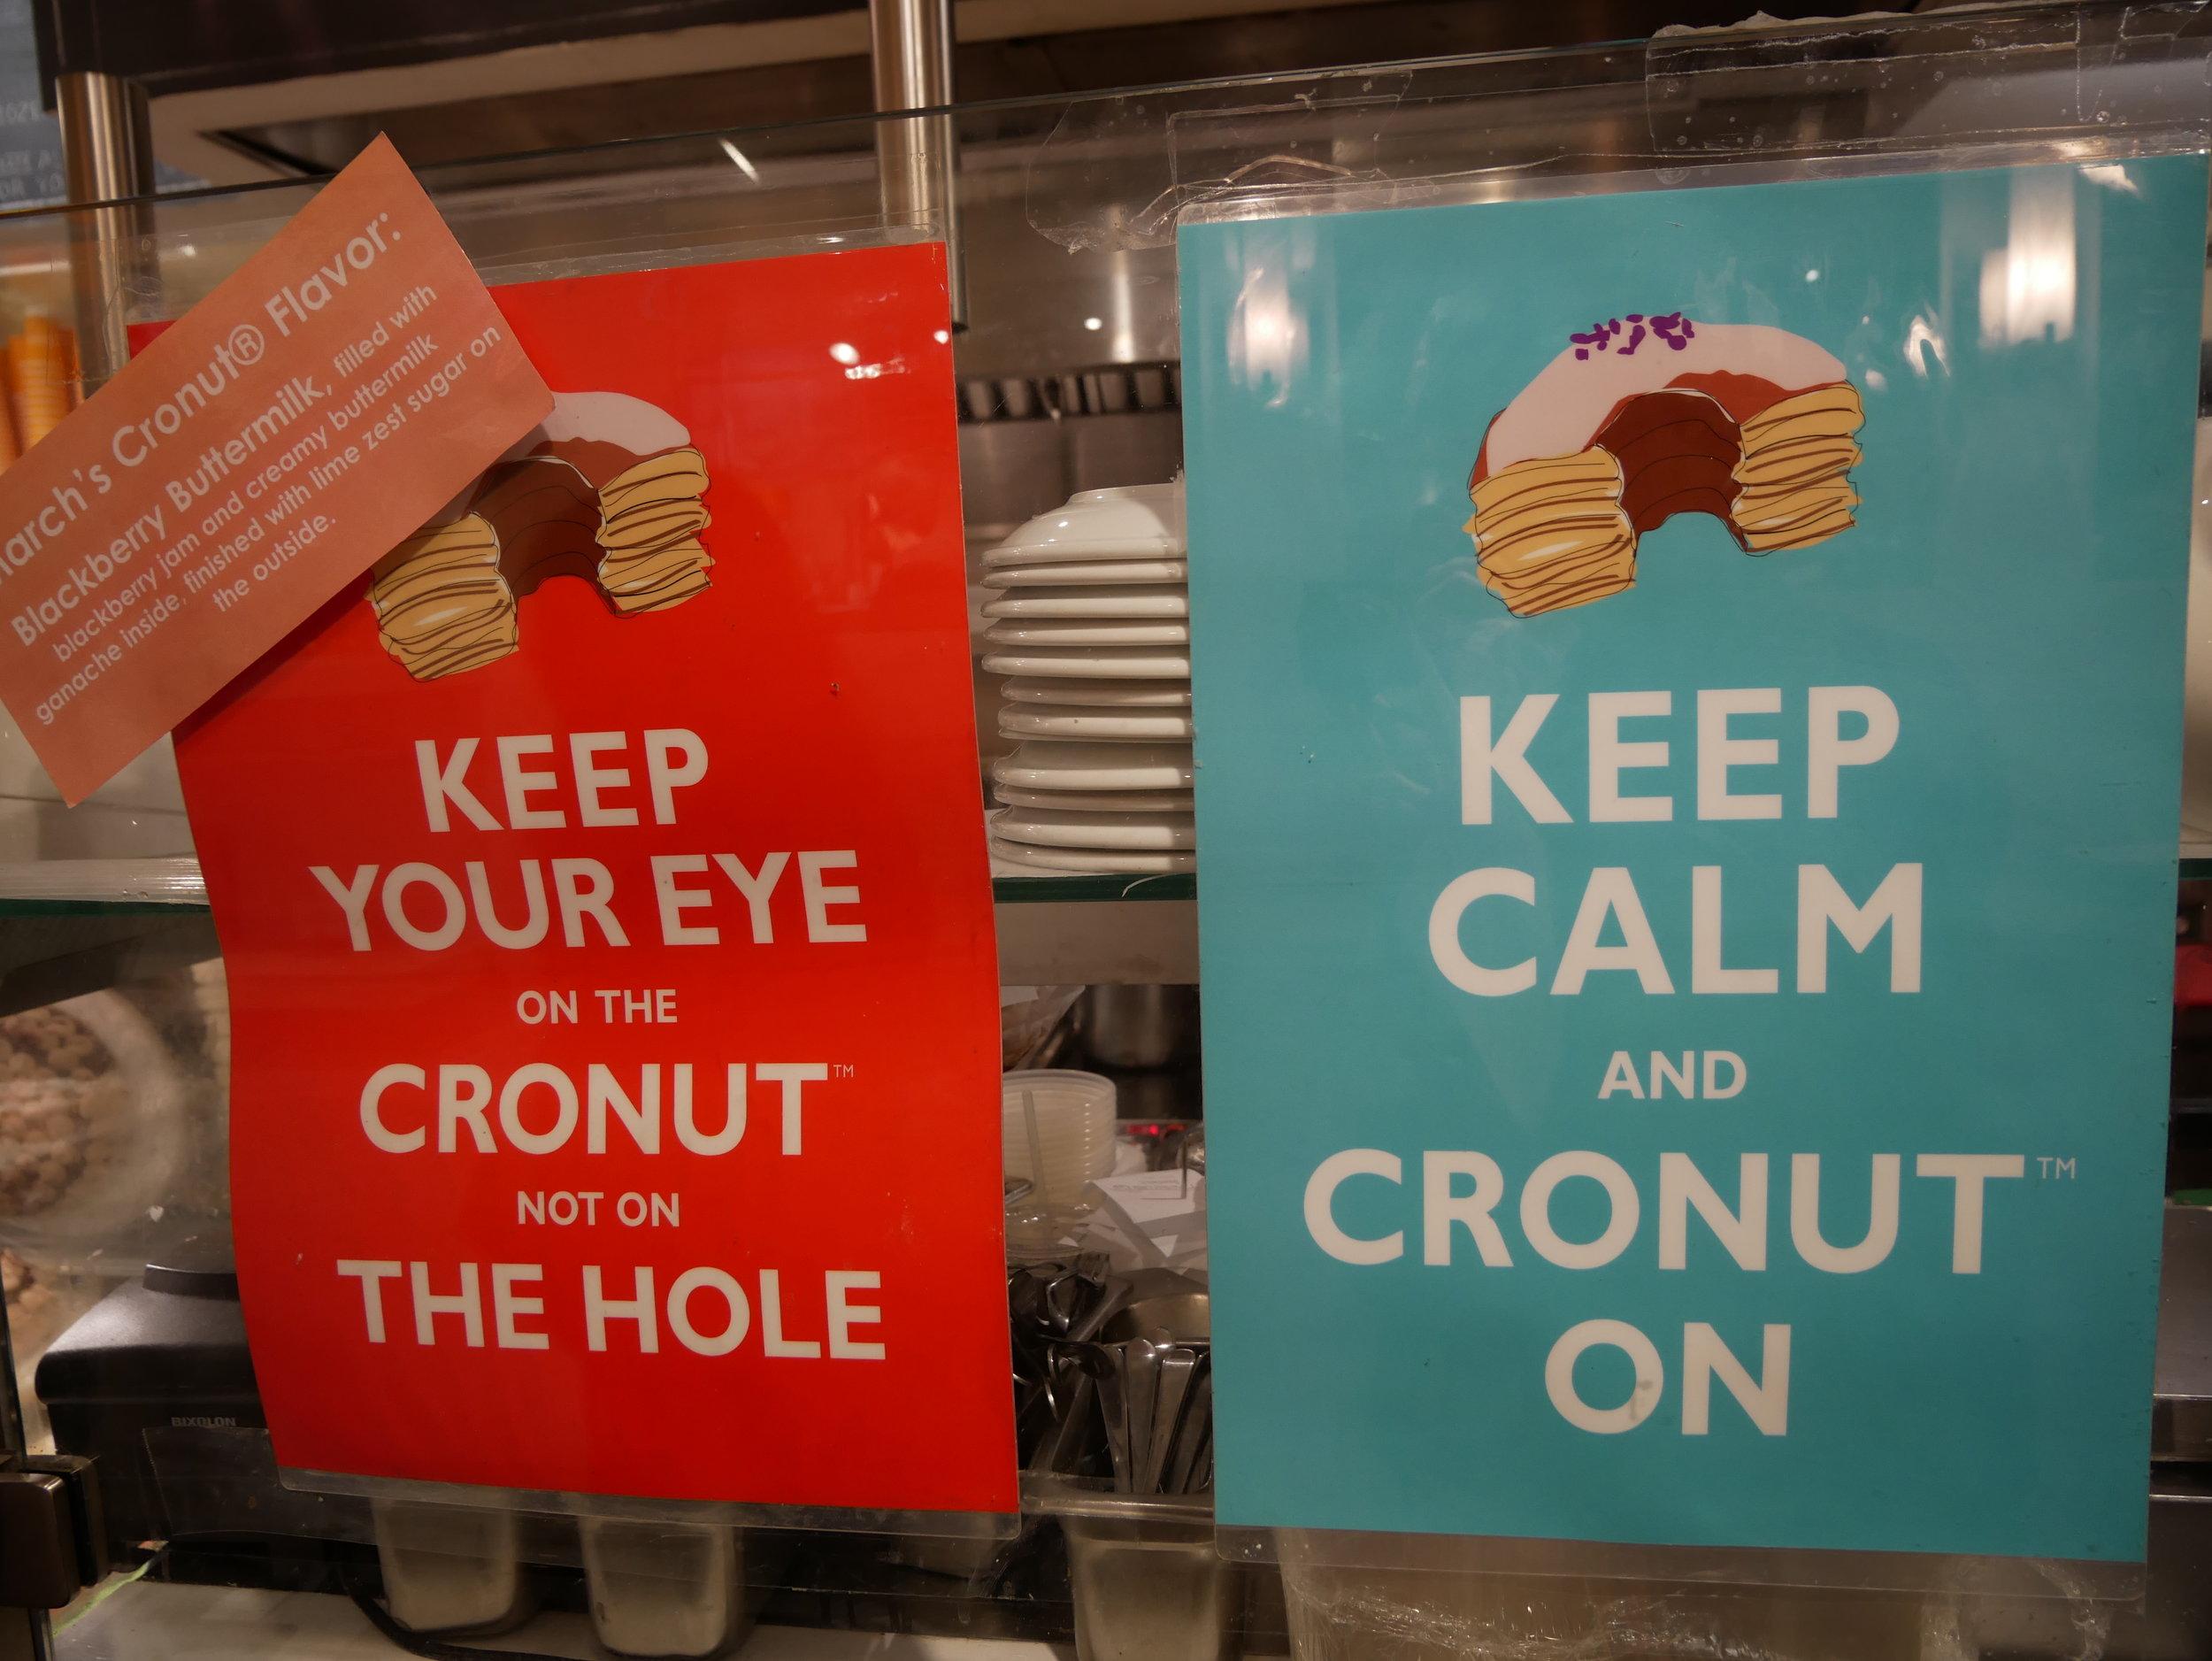 Cronut signs